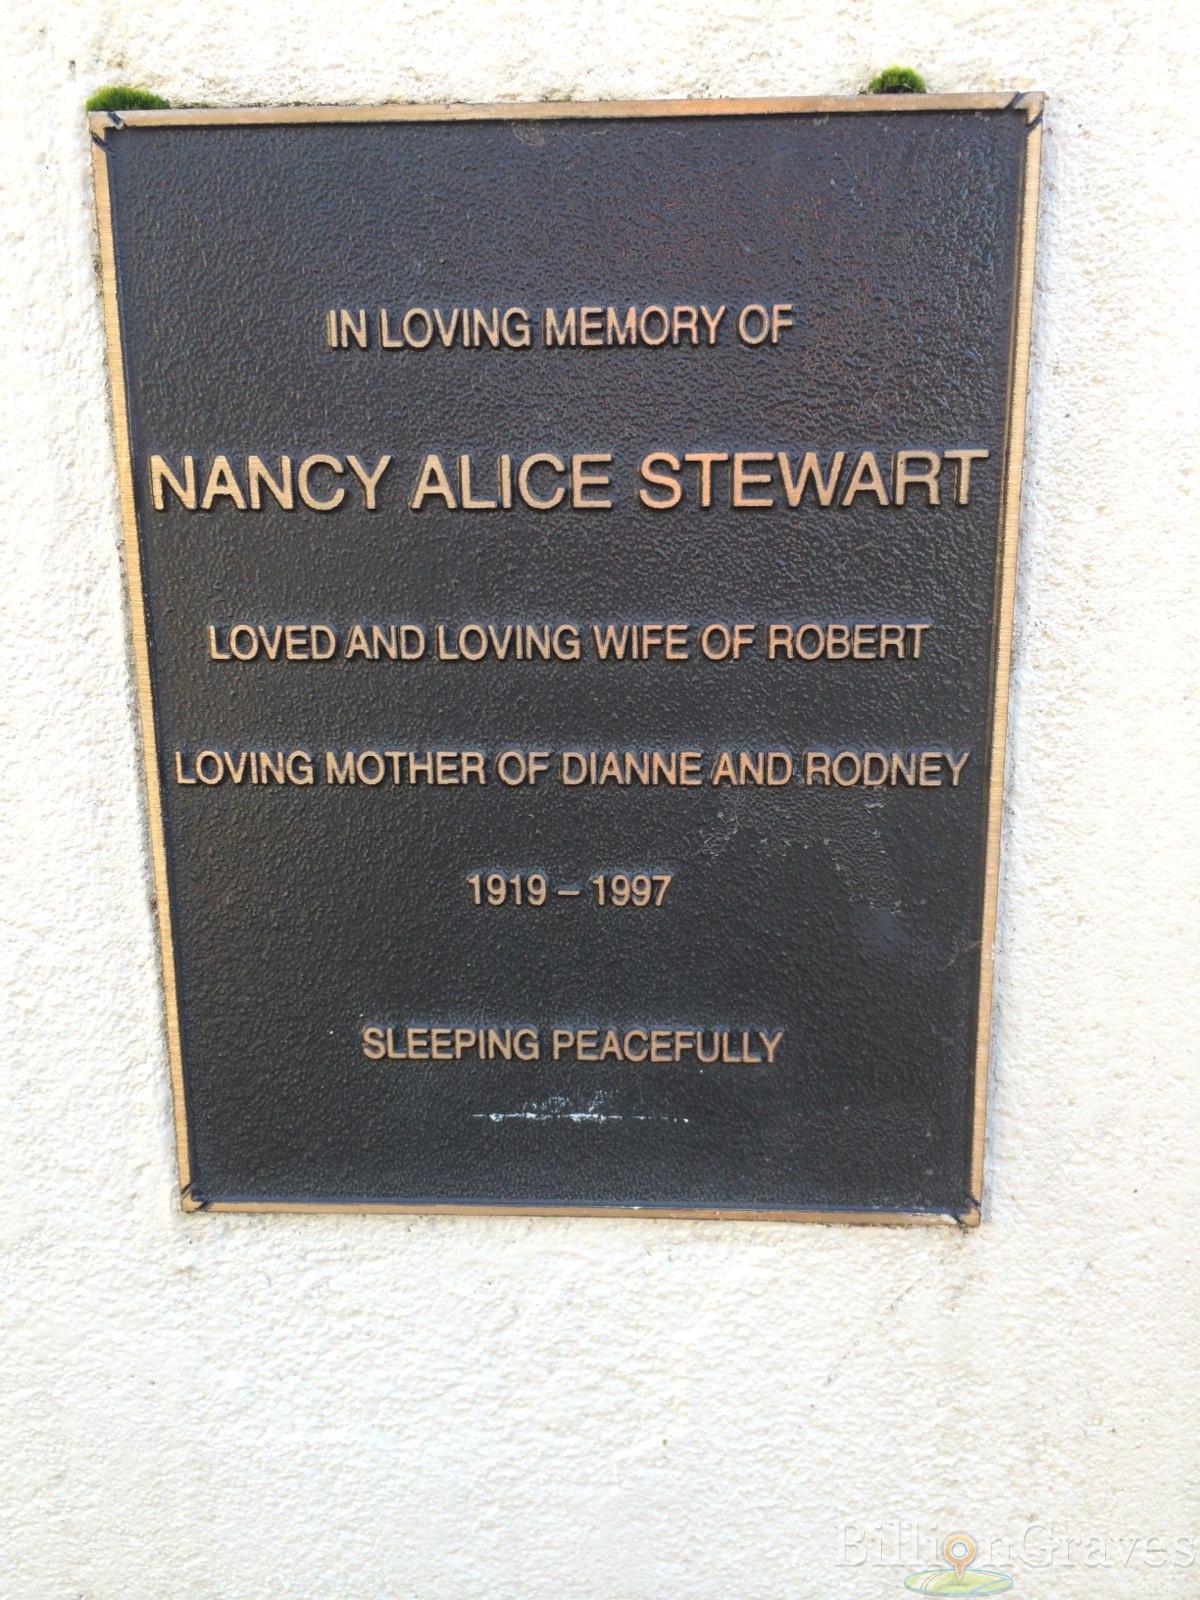 grave site of rodney stewart billiongraves headstone image of rodney stewart